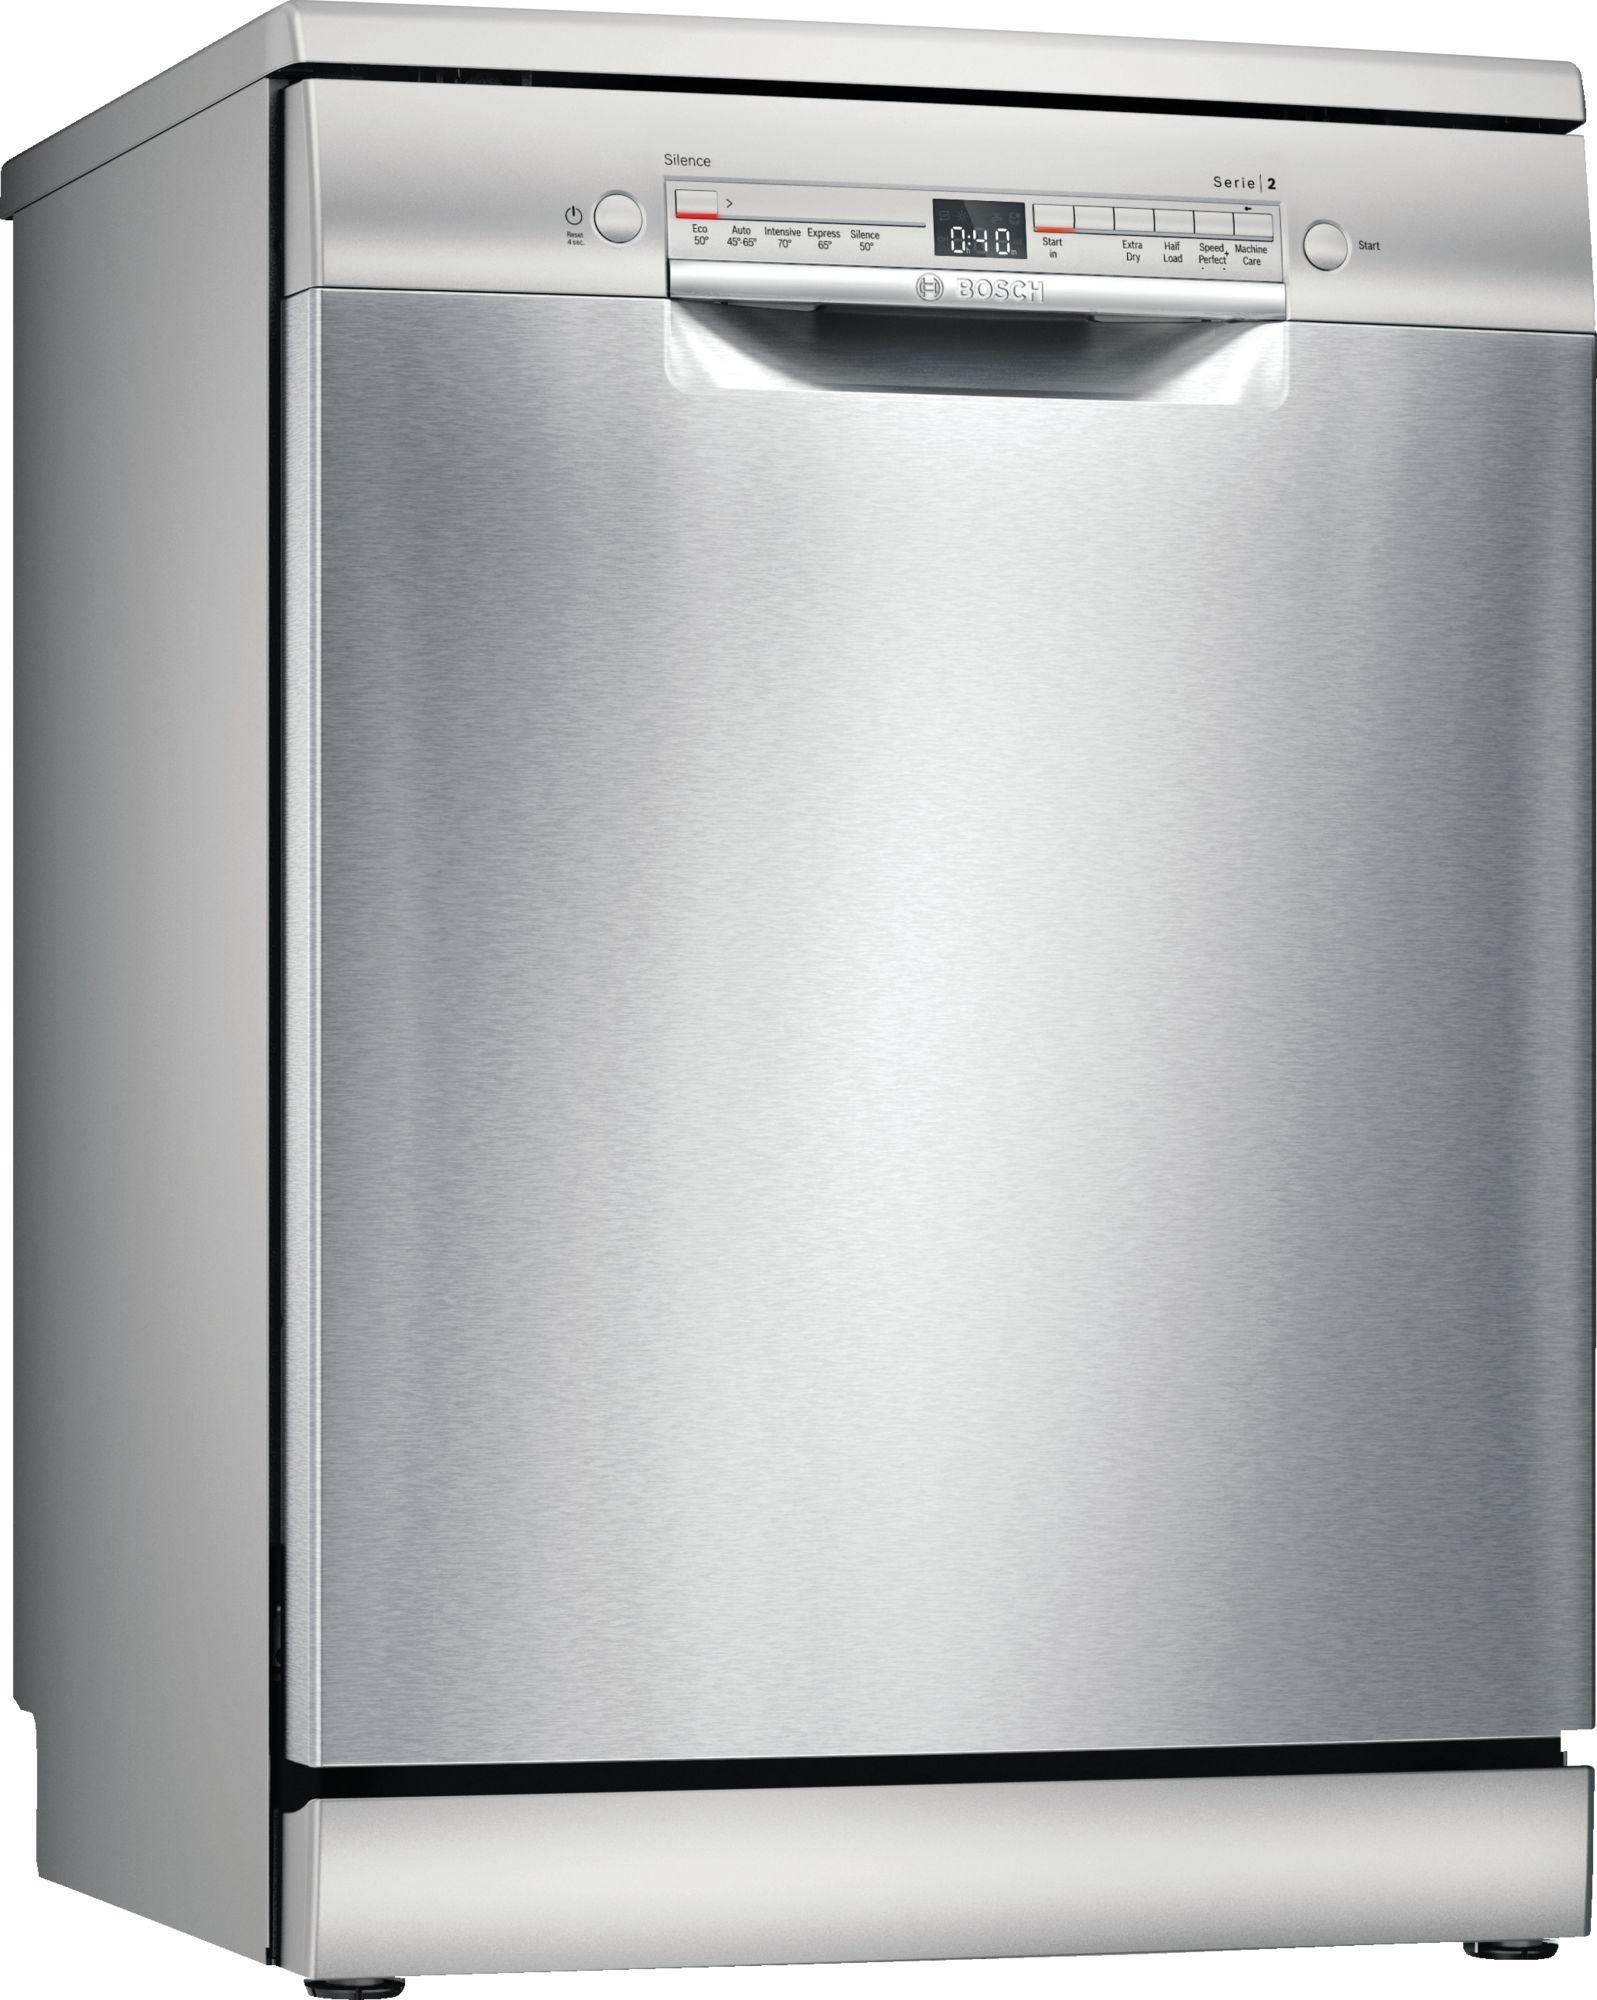 Image of Serie 2 SGS2HVI66G 60cm Standard Dishwasher | Silver Innox